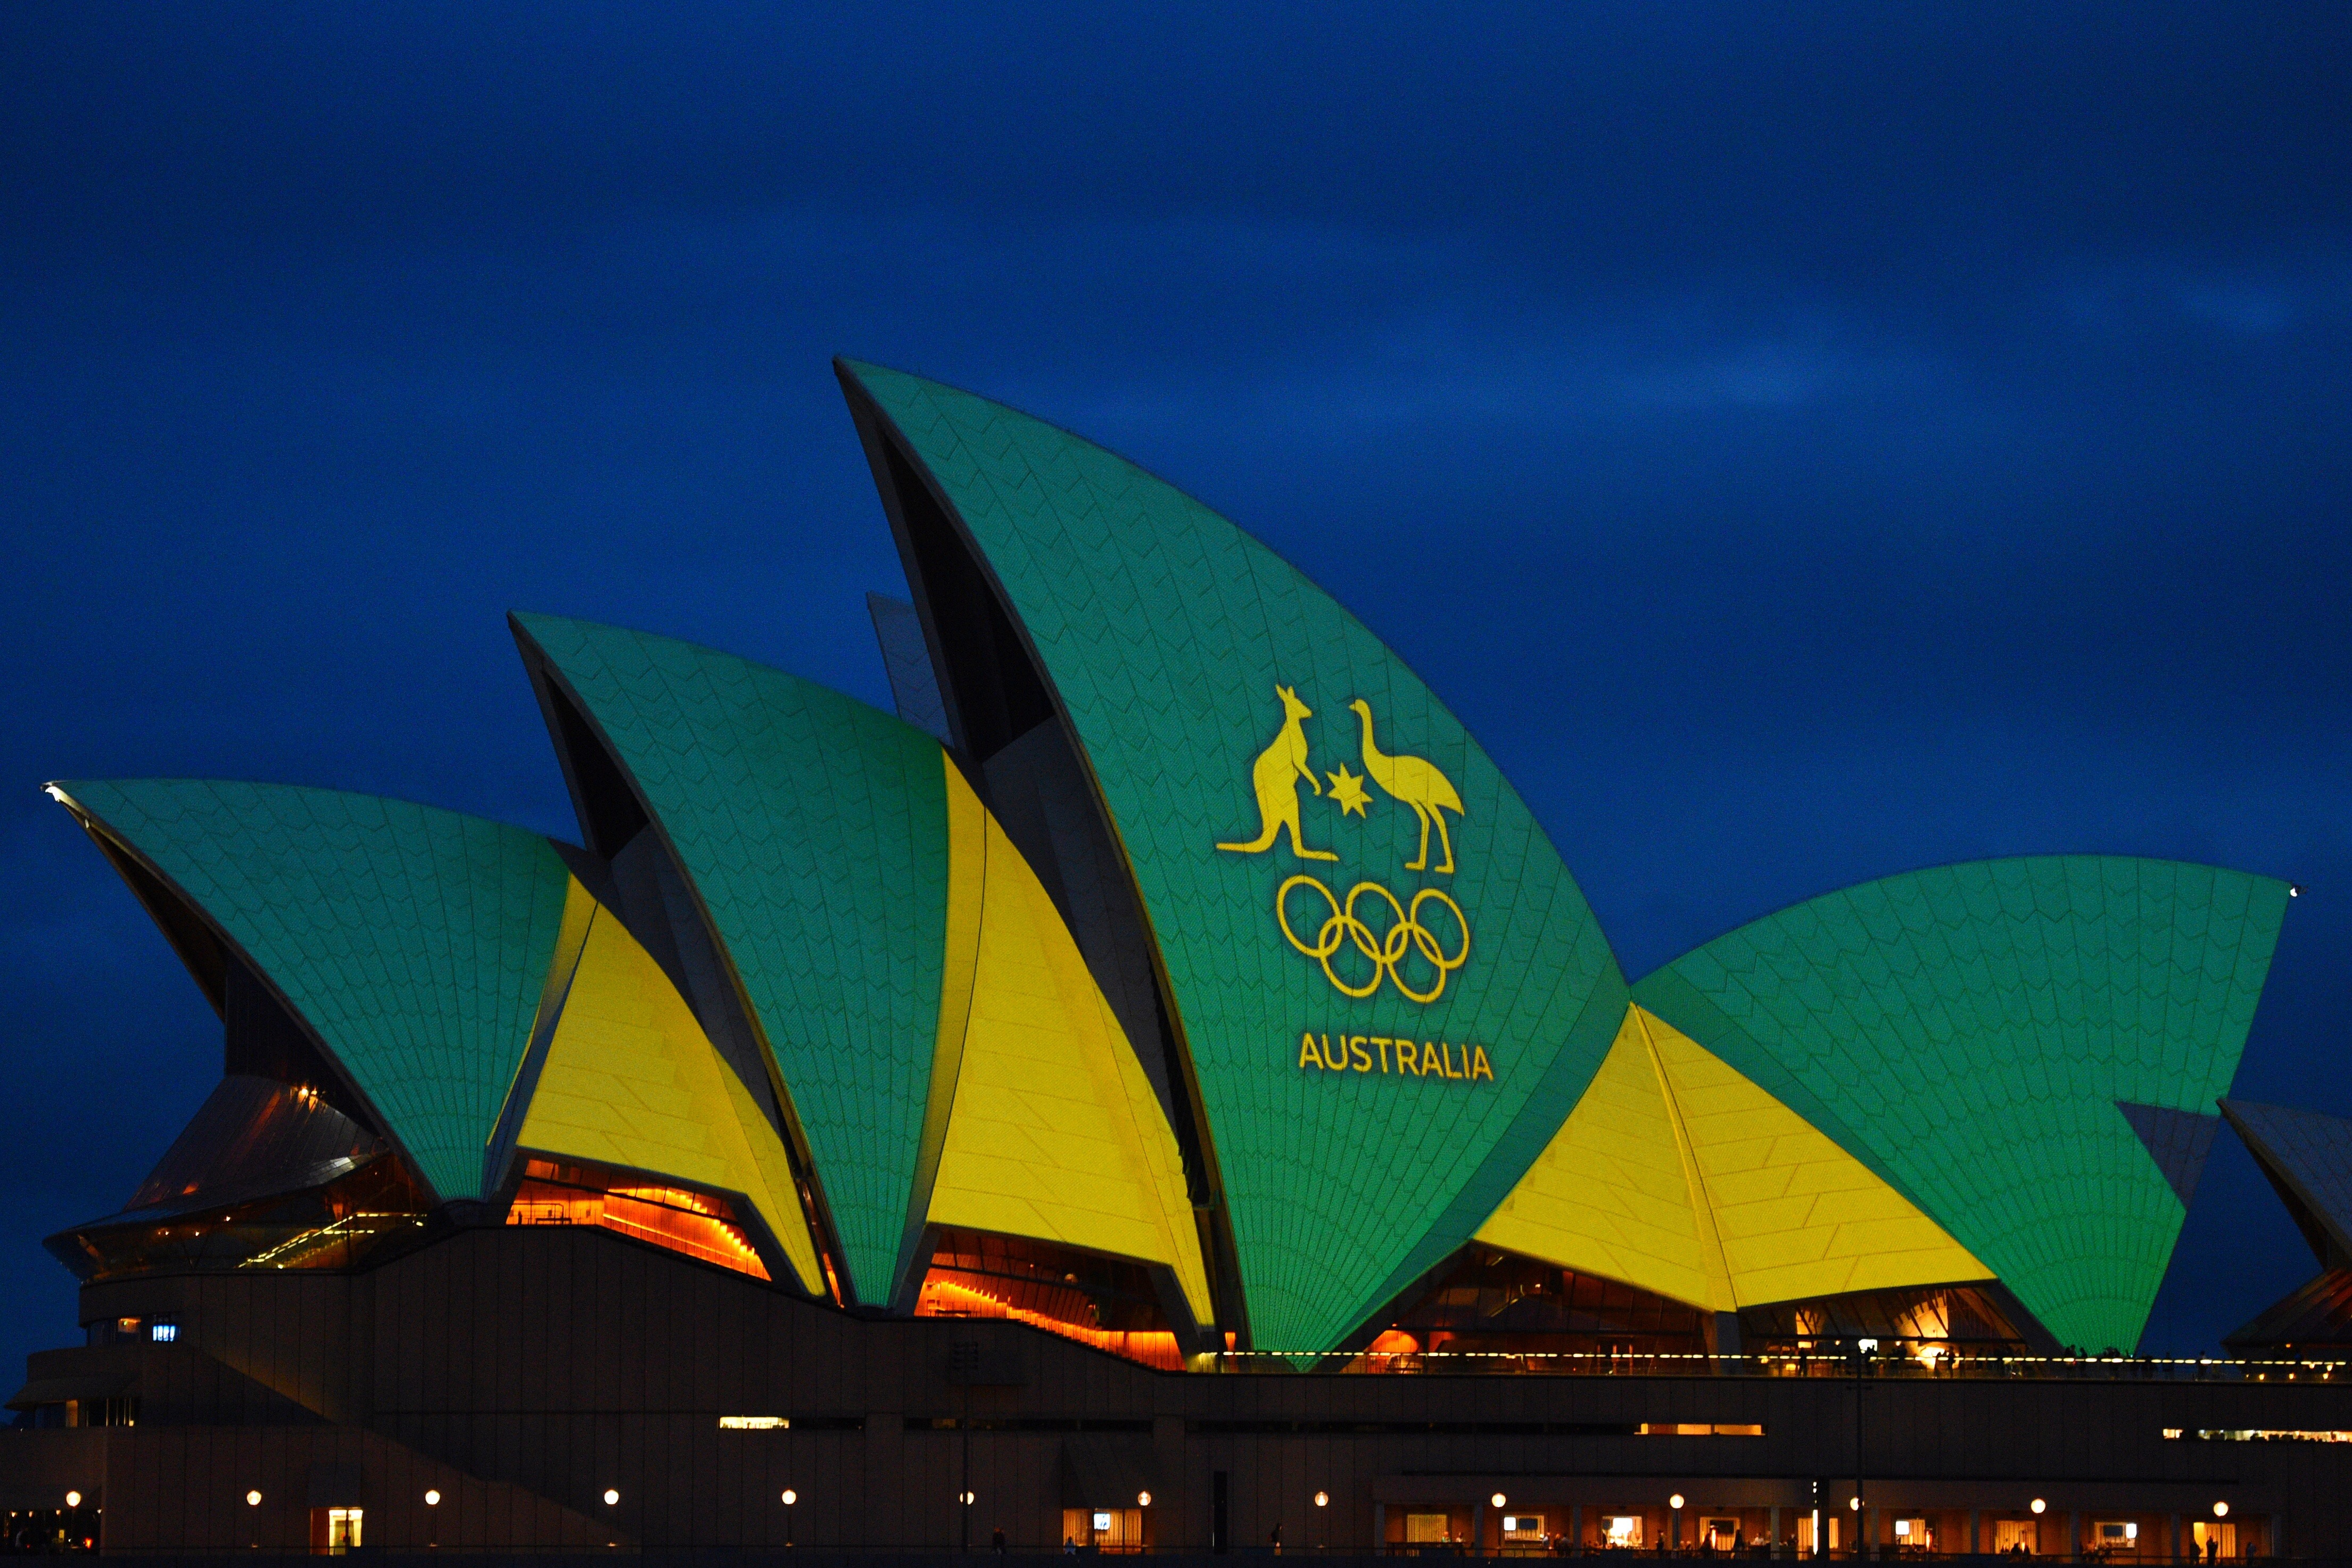 Rio olympics dates in Sydney